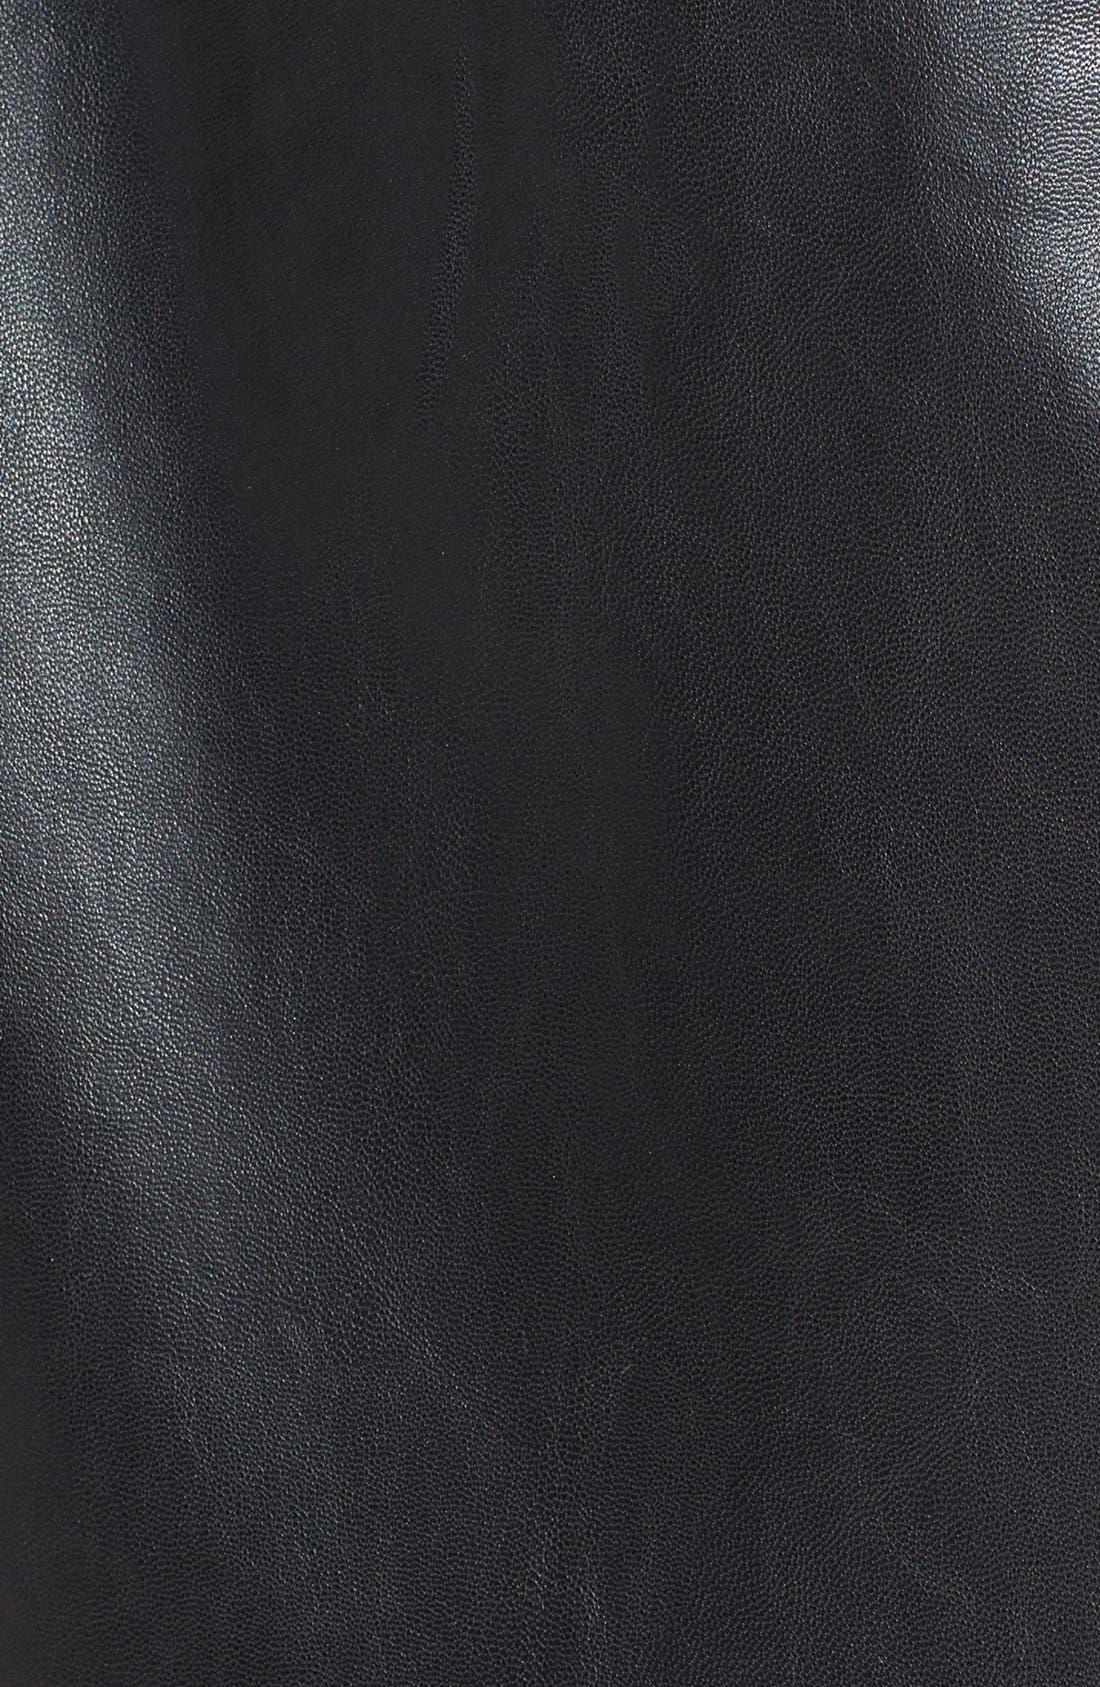 Alternate Image 4  - ASTR Chiffon Panel Faux Leather Tank